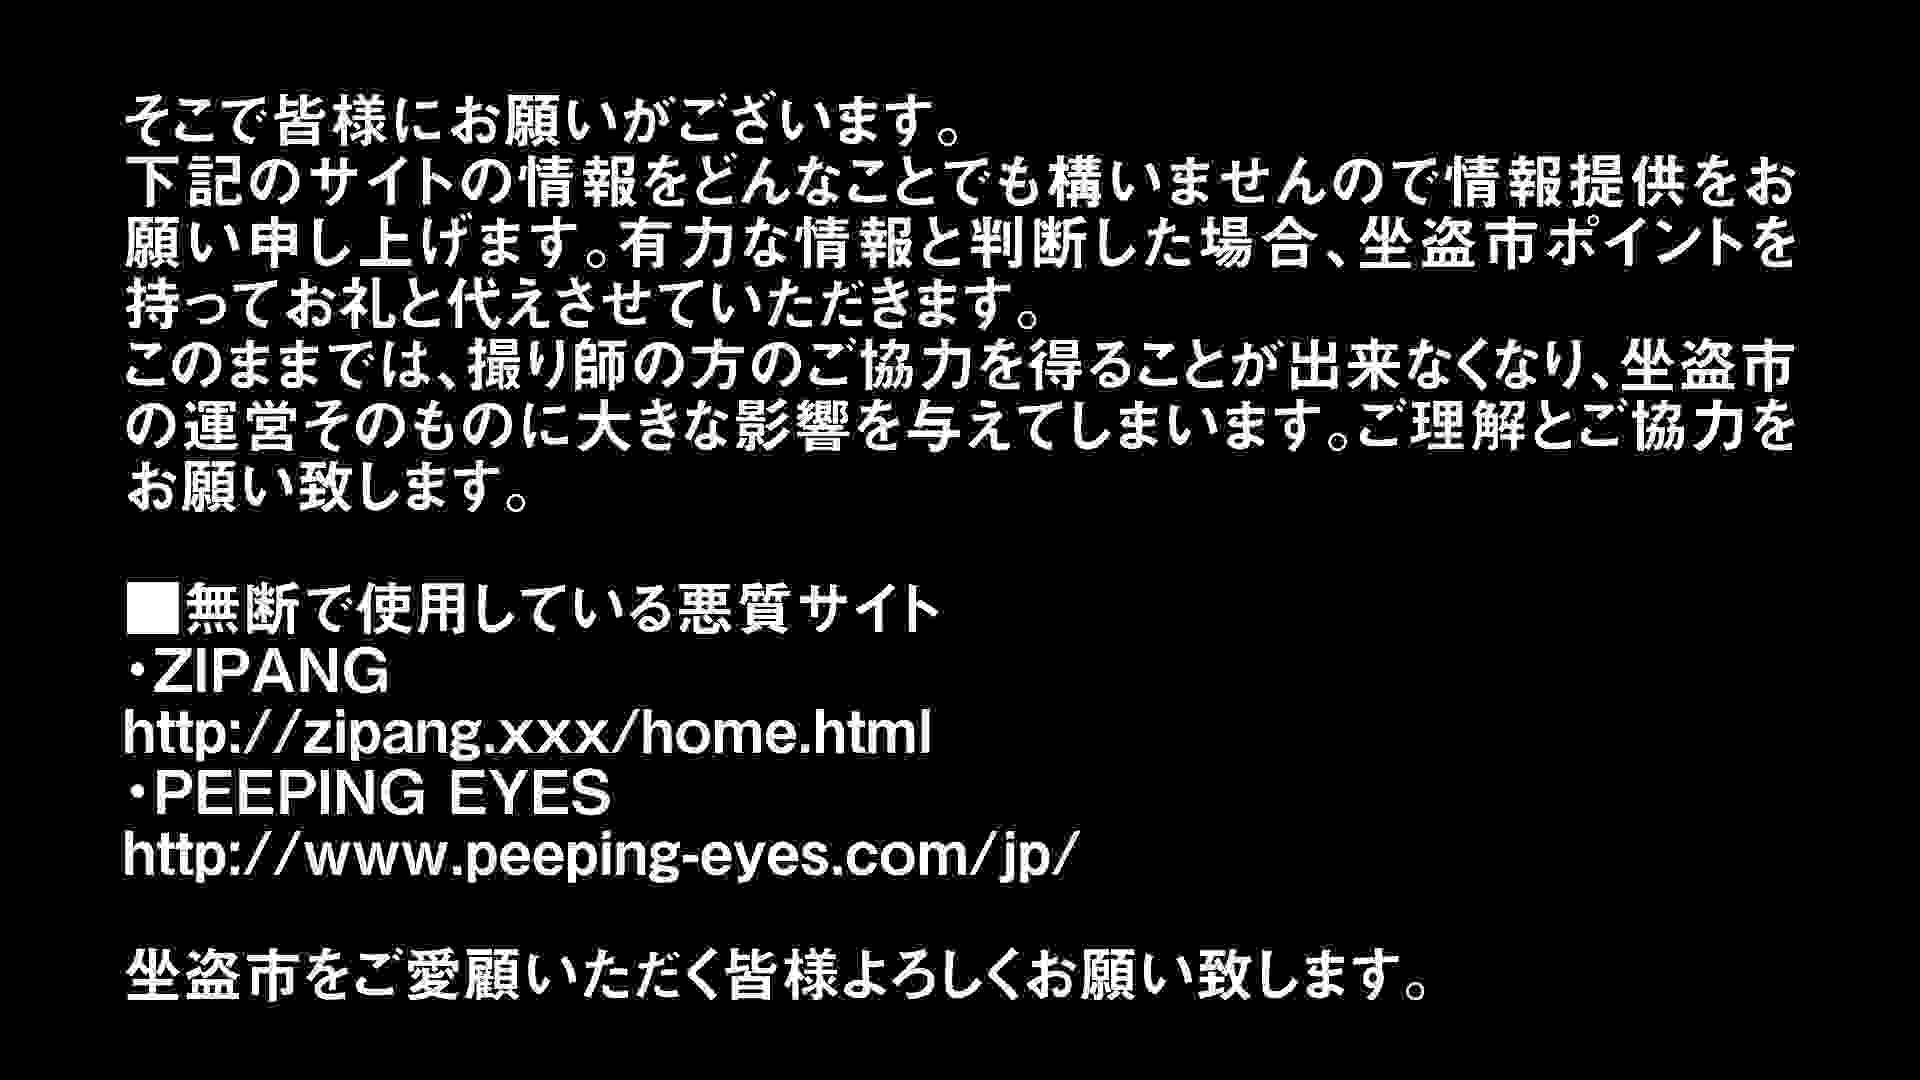 Aquaな露天風呂Vol.300 盗撮シリーズ | 露天風呂編  110PIX 41